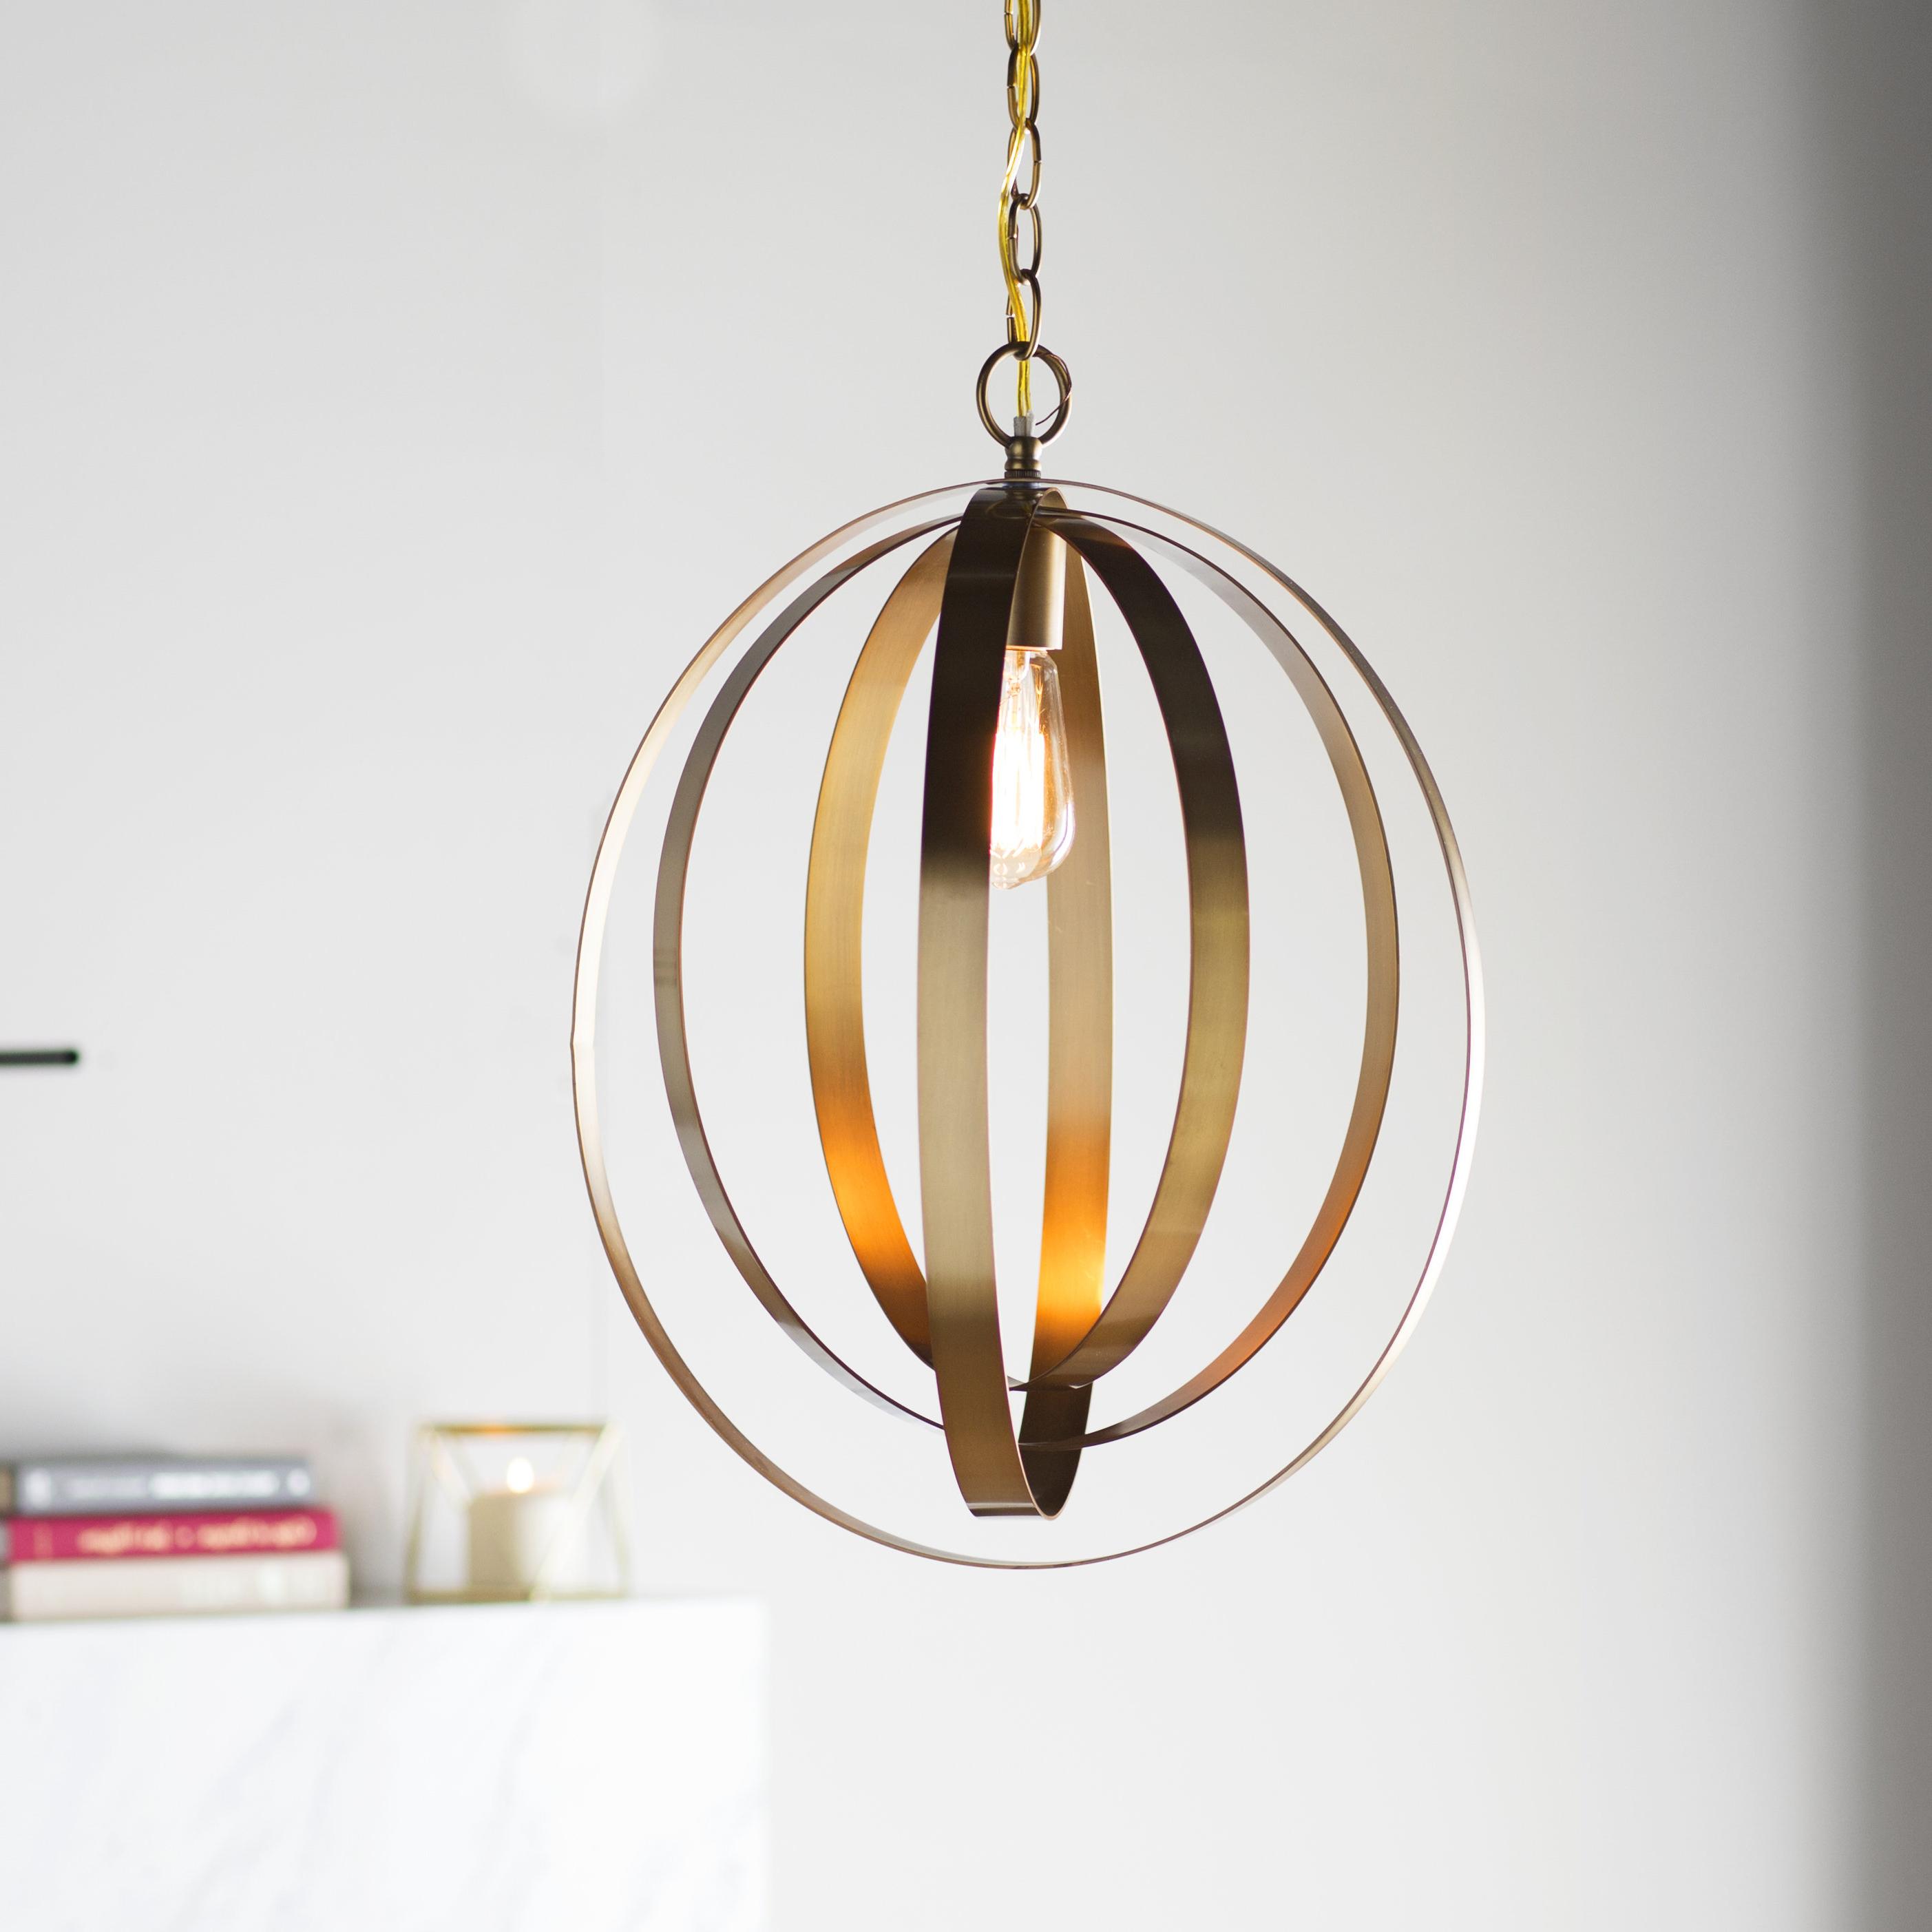 Kilby 1 Light Pendants Within Famous Arango 1 Light Led Globe Pendant (View 11 of 20)